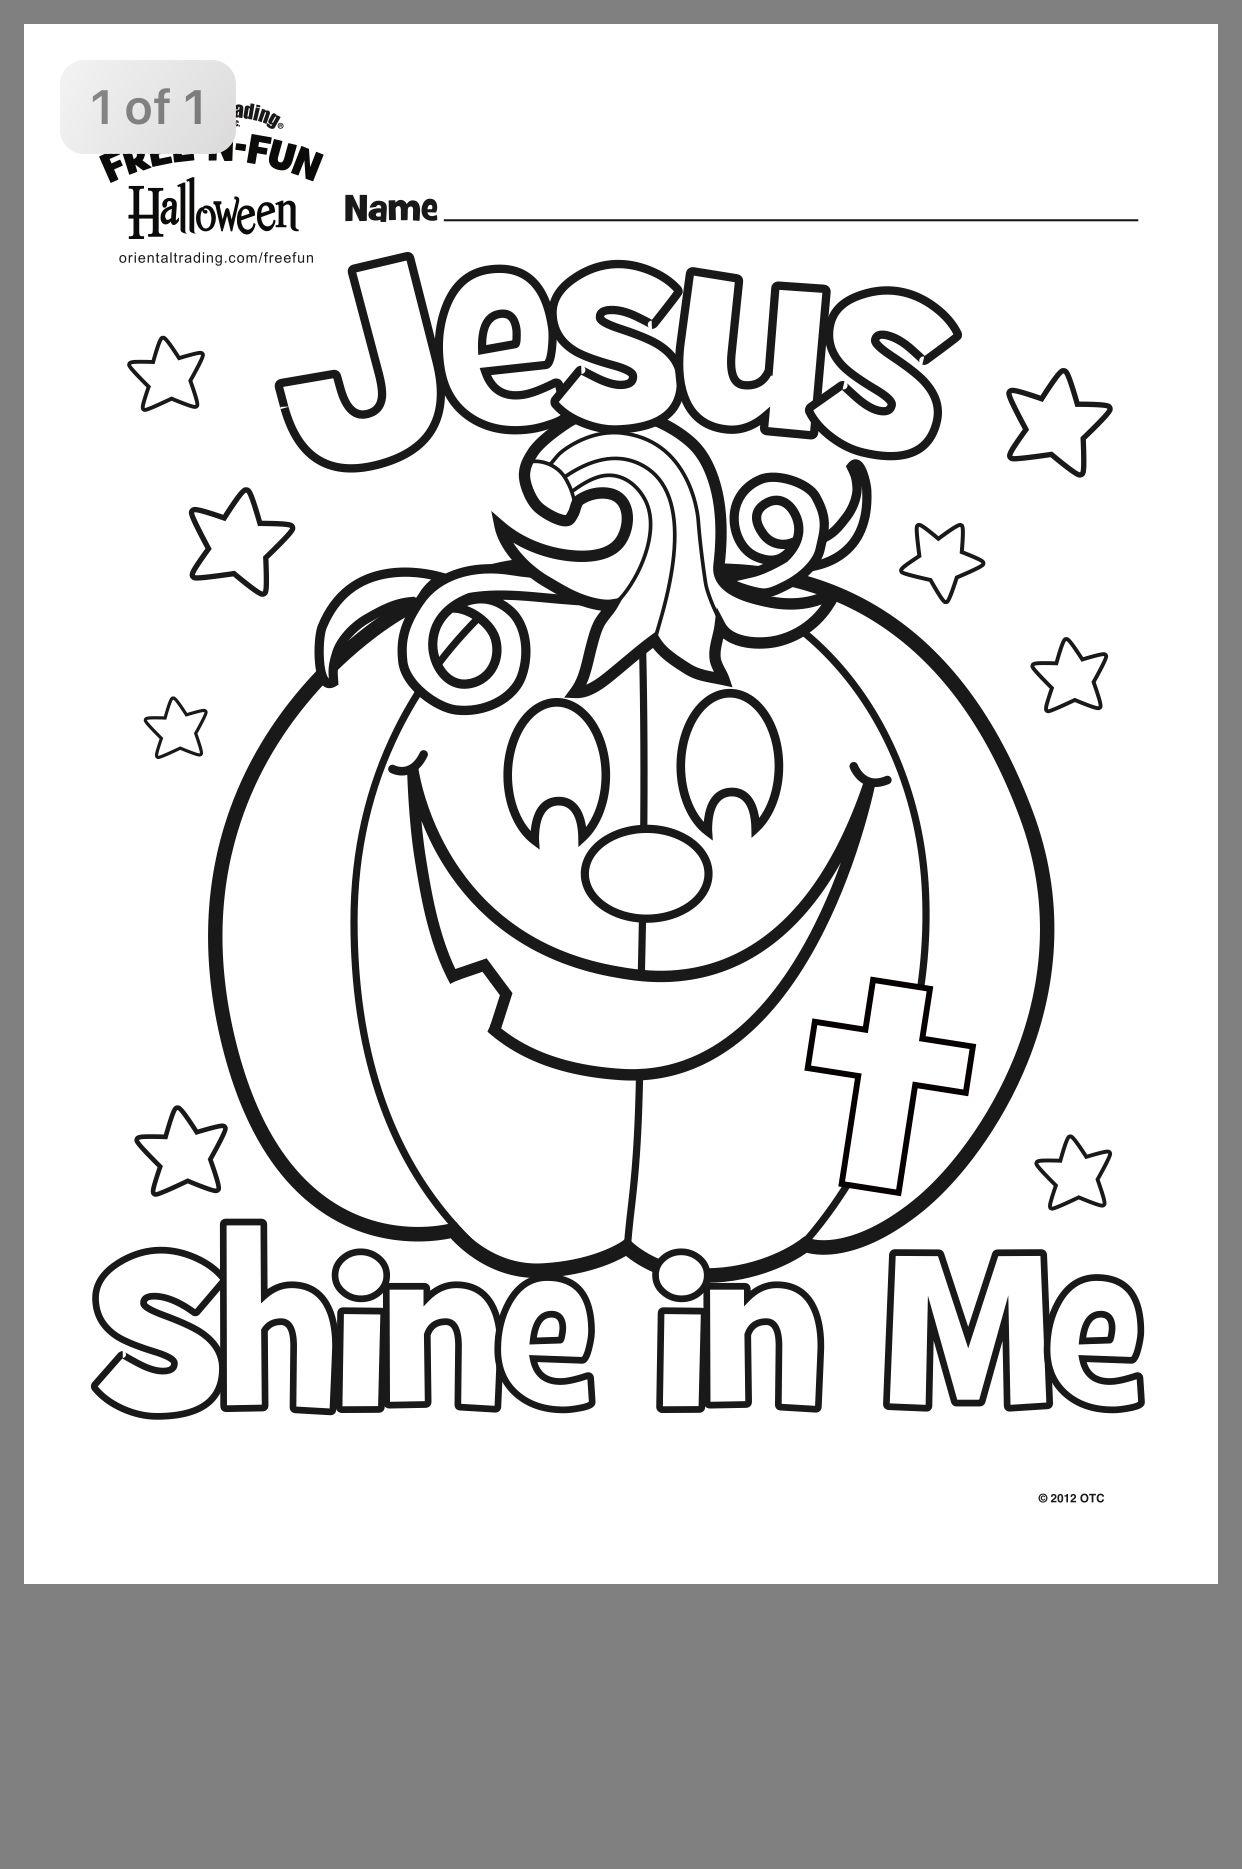 Pin By Addie Dietrich On Church Sunday School Lessons Sunday School Crafts Sunday School Activities